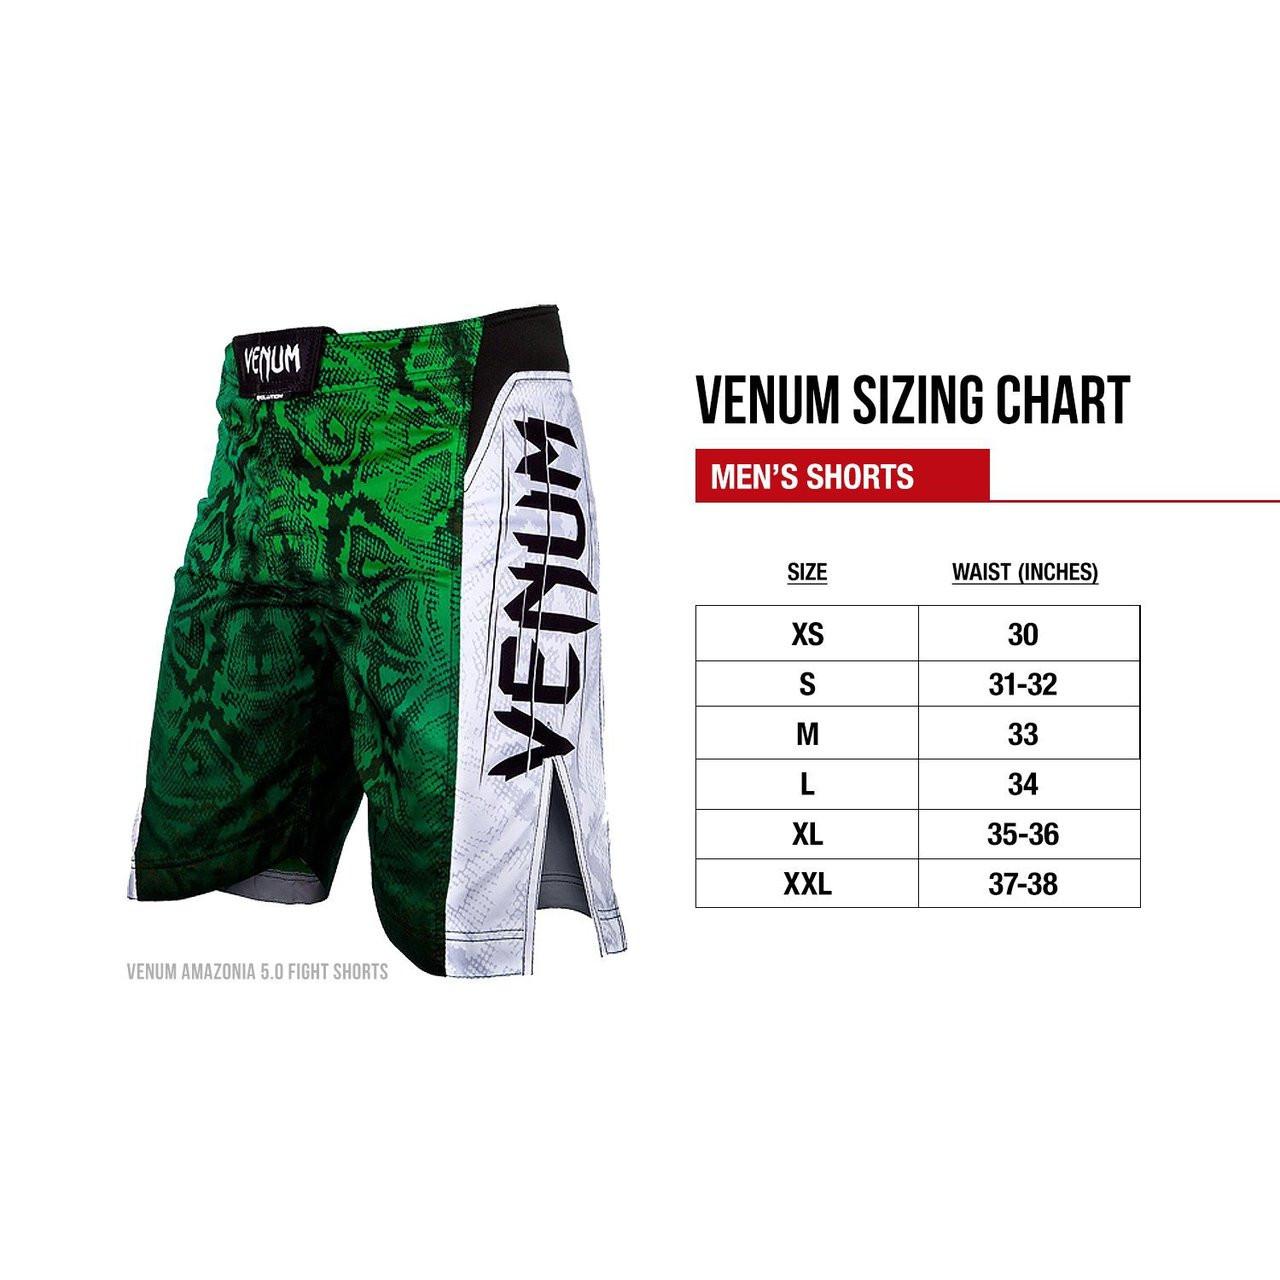 Venum amazonia green fight shorts available at thejiujitsushop great for grappling also the jiu jitsu shop rh